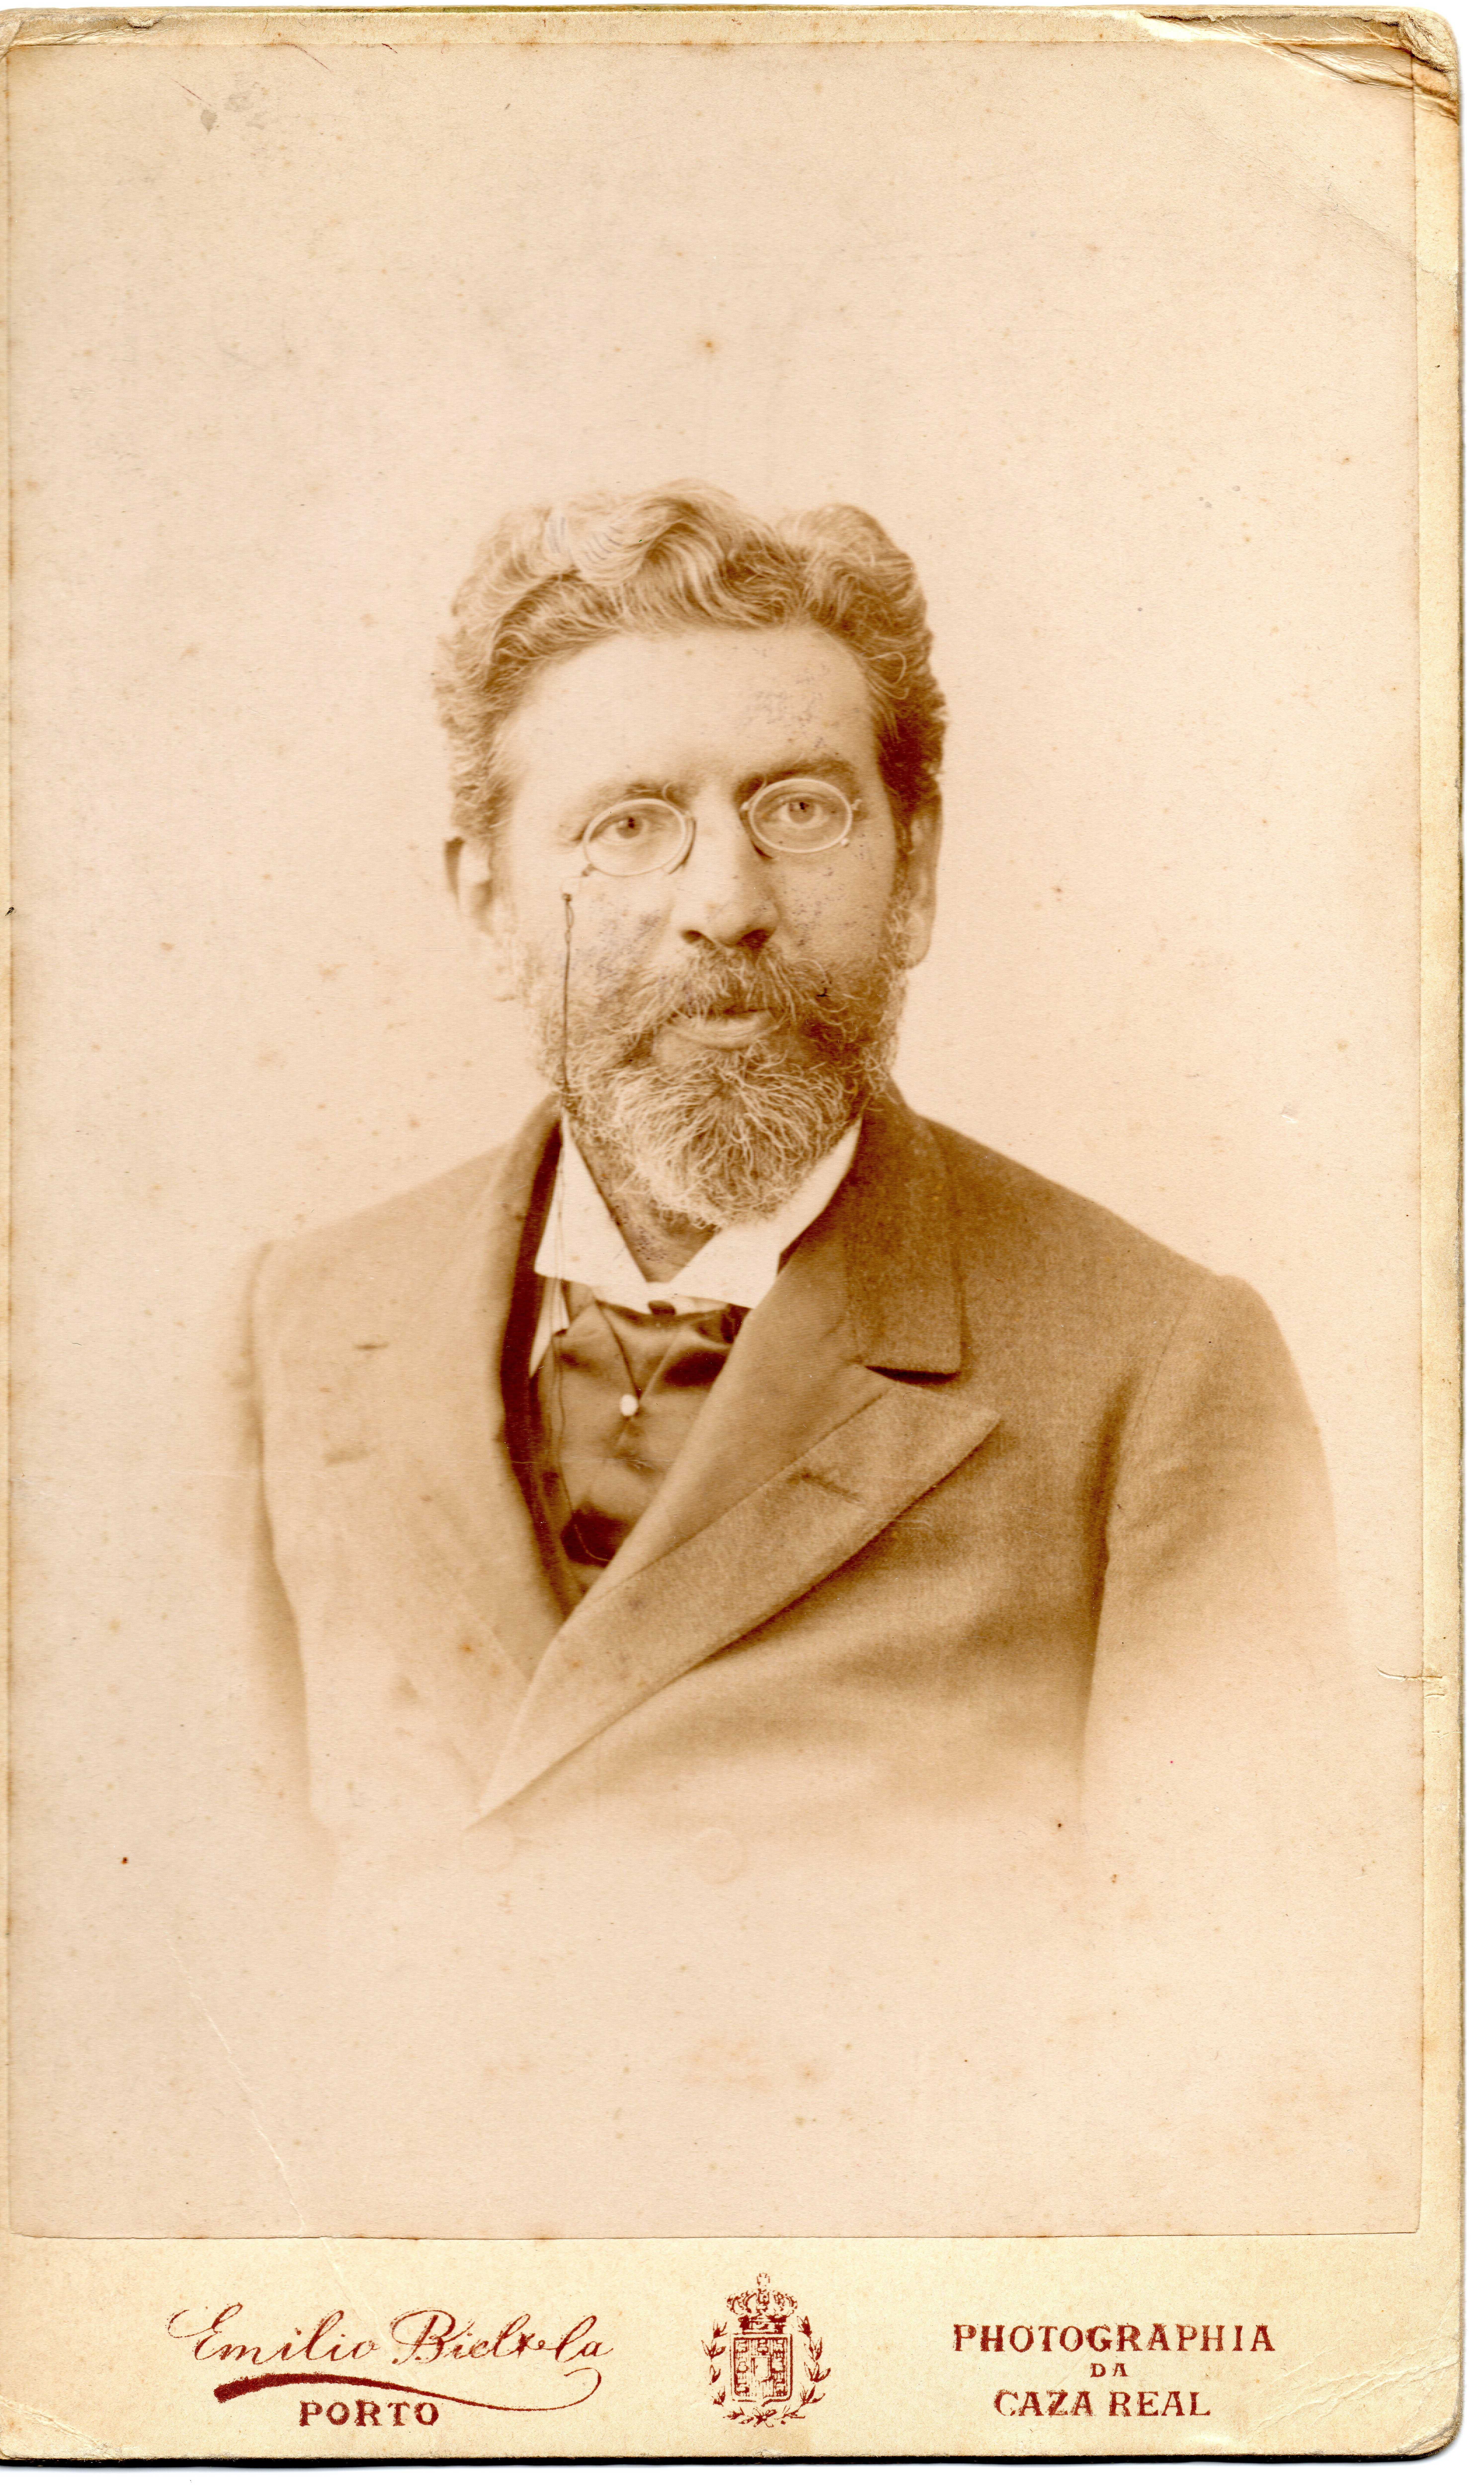 Photograph of Jose Carlos Rodrigues (1844-1922)